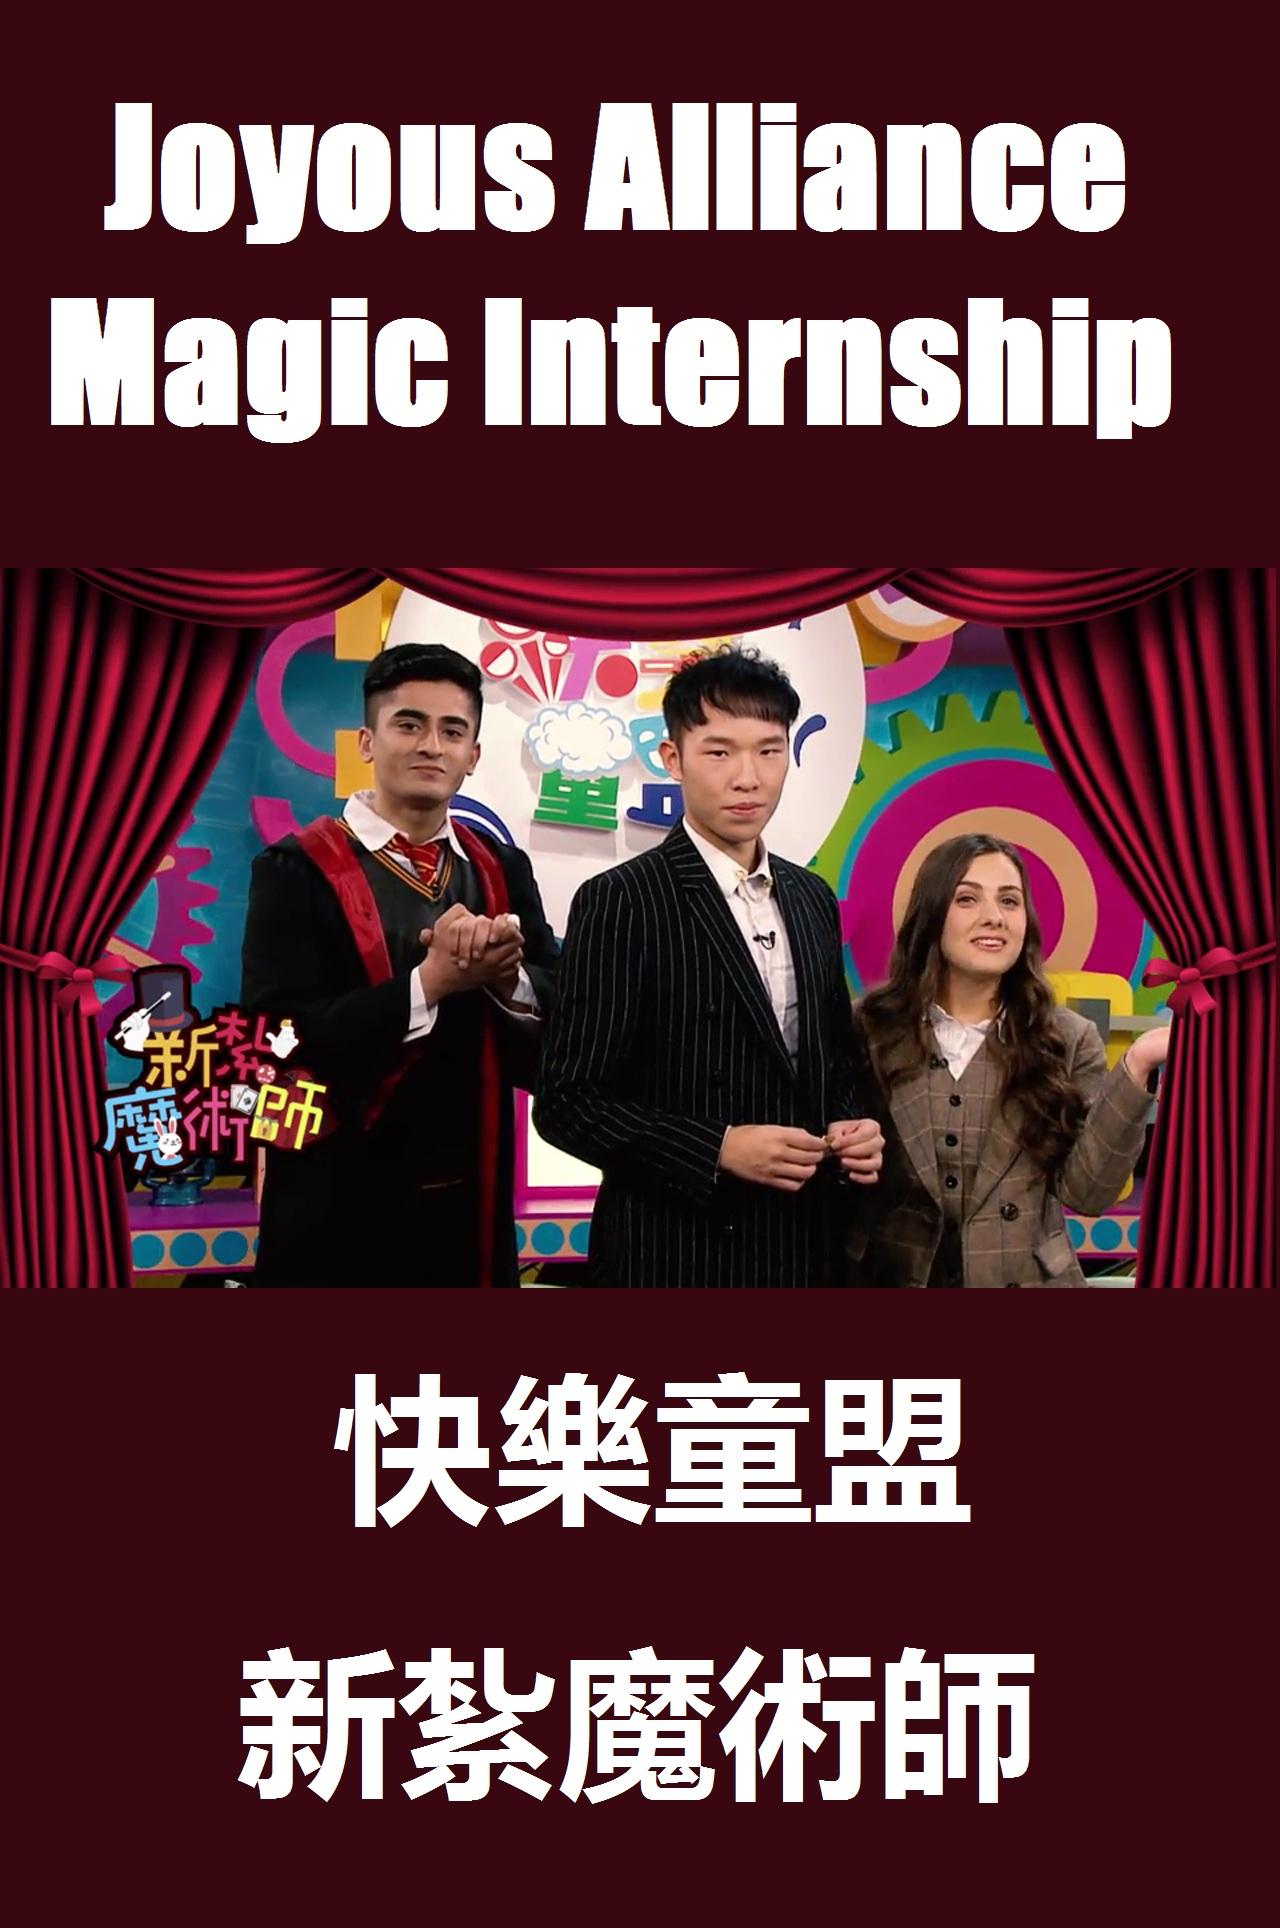 Joyous Alliance - Magic Internship - 快樂童盟 - 新紮魔術師